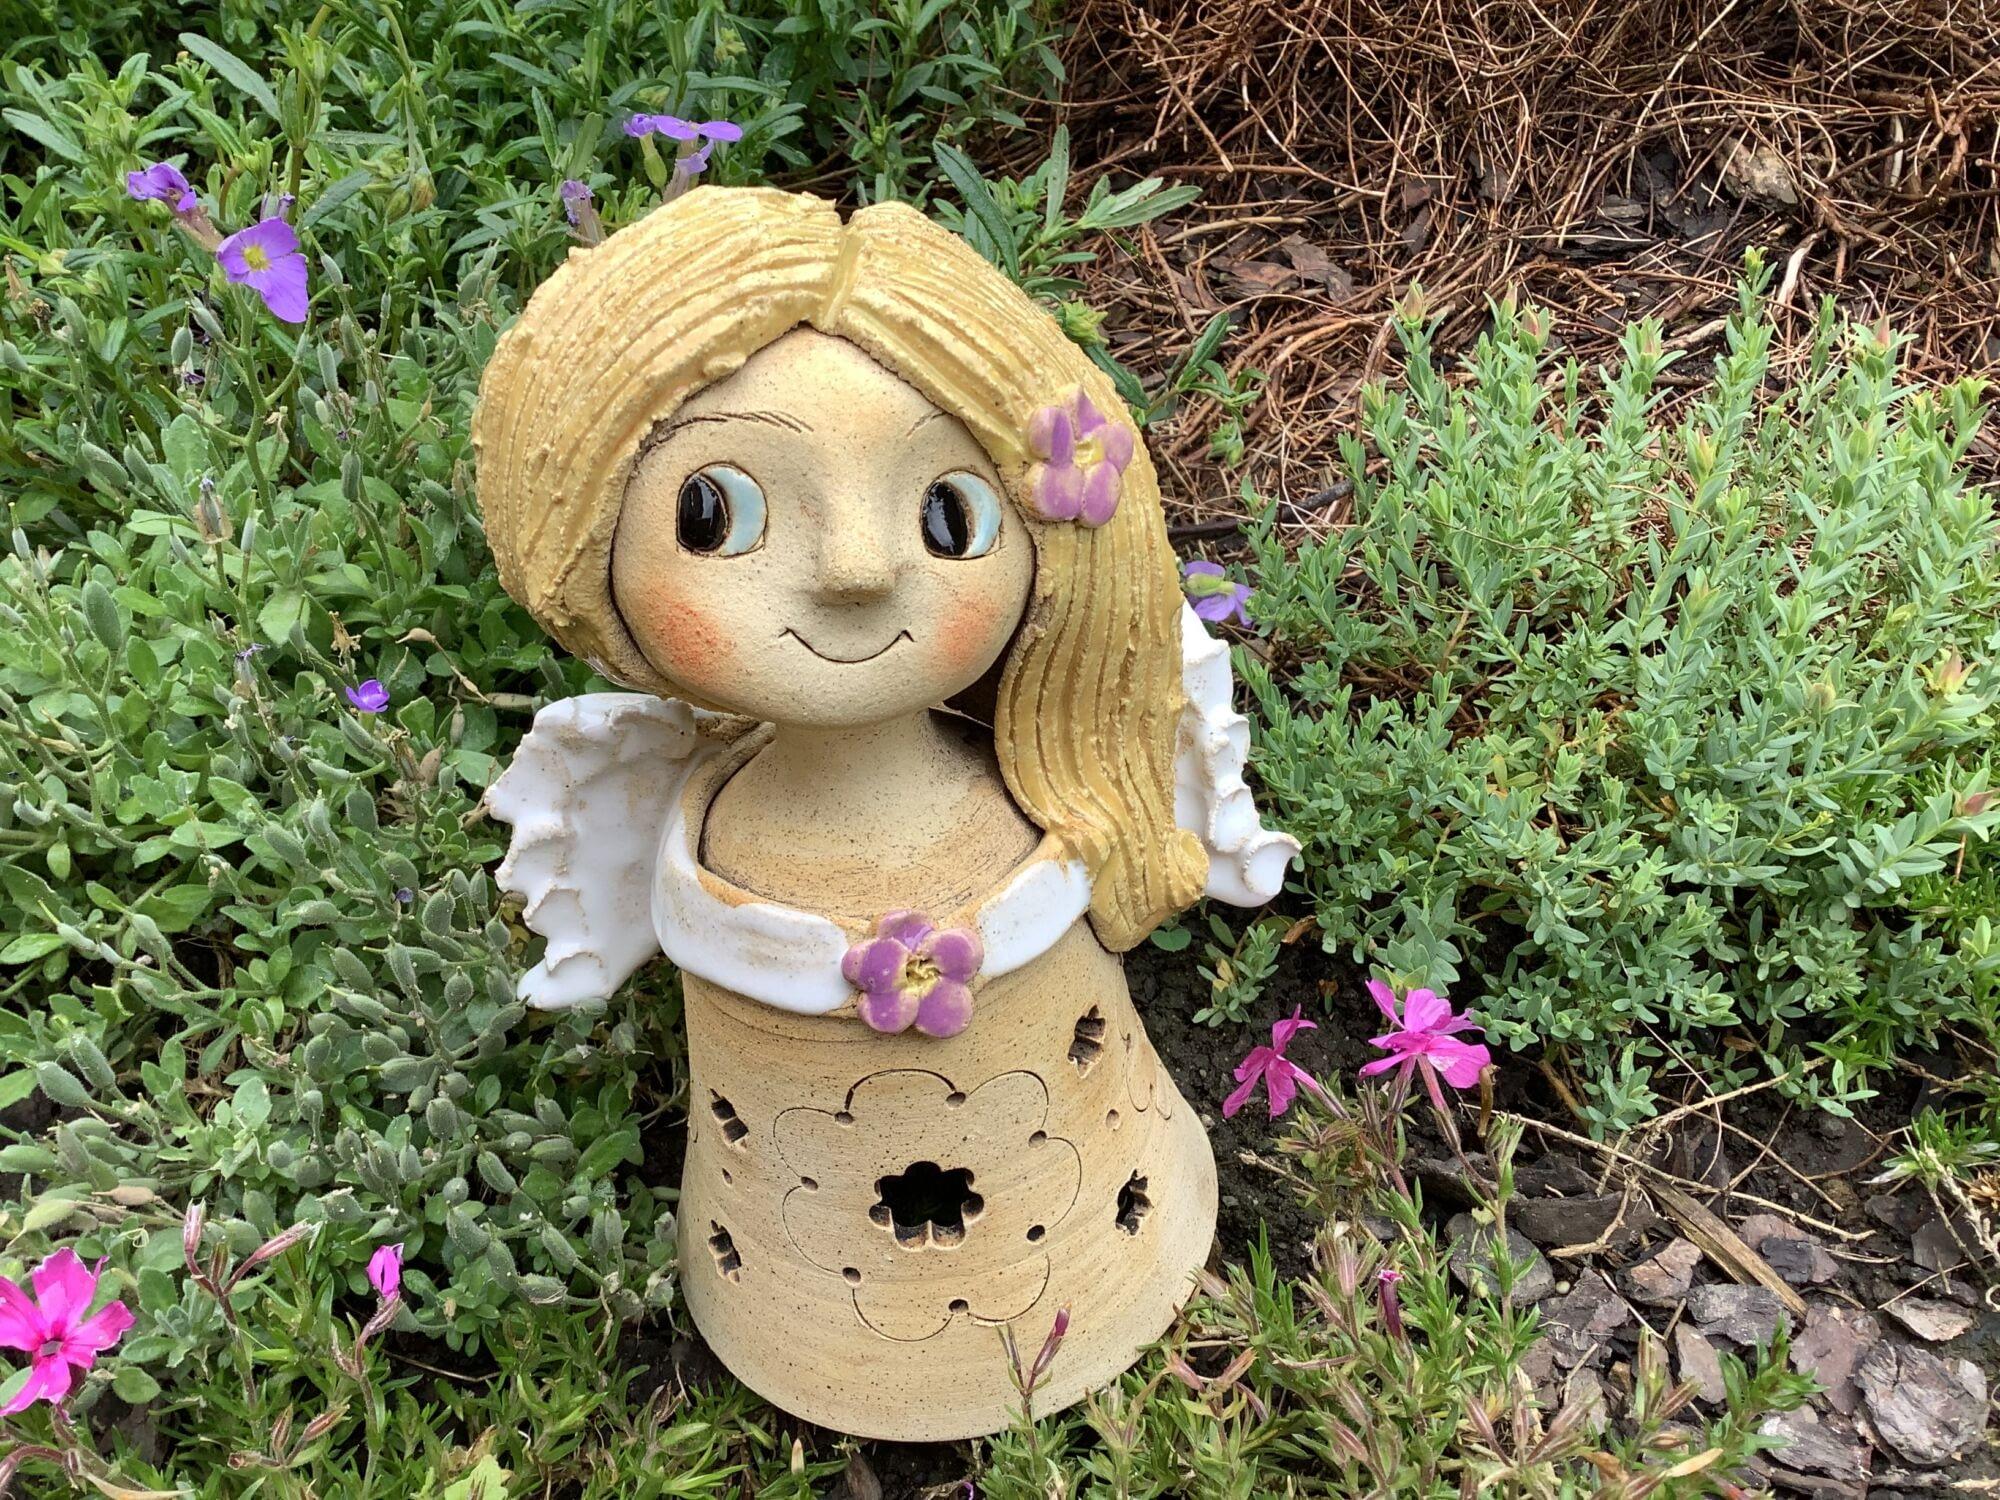 Lampicka andelka květ dekorace víla keramika světlo svíčka keramikaandee